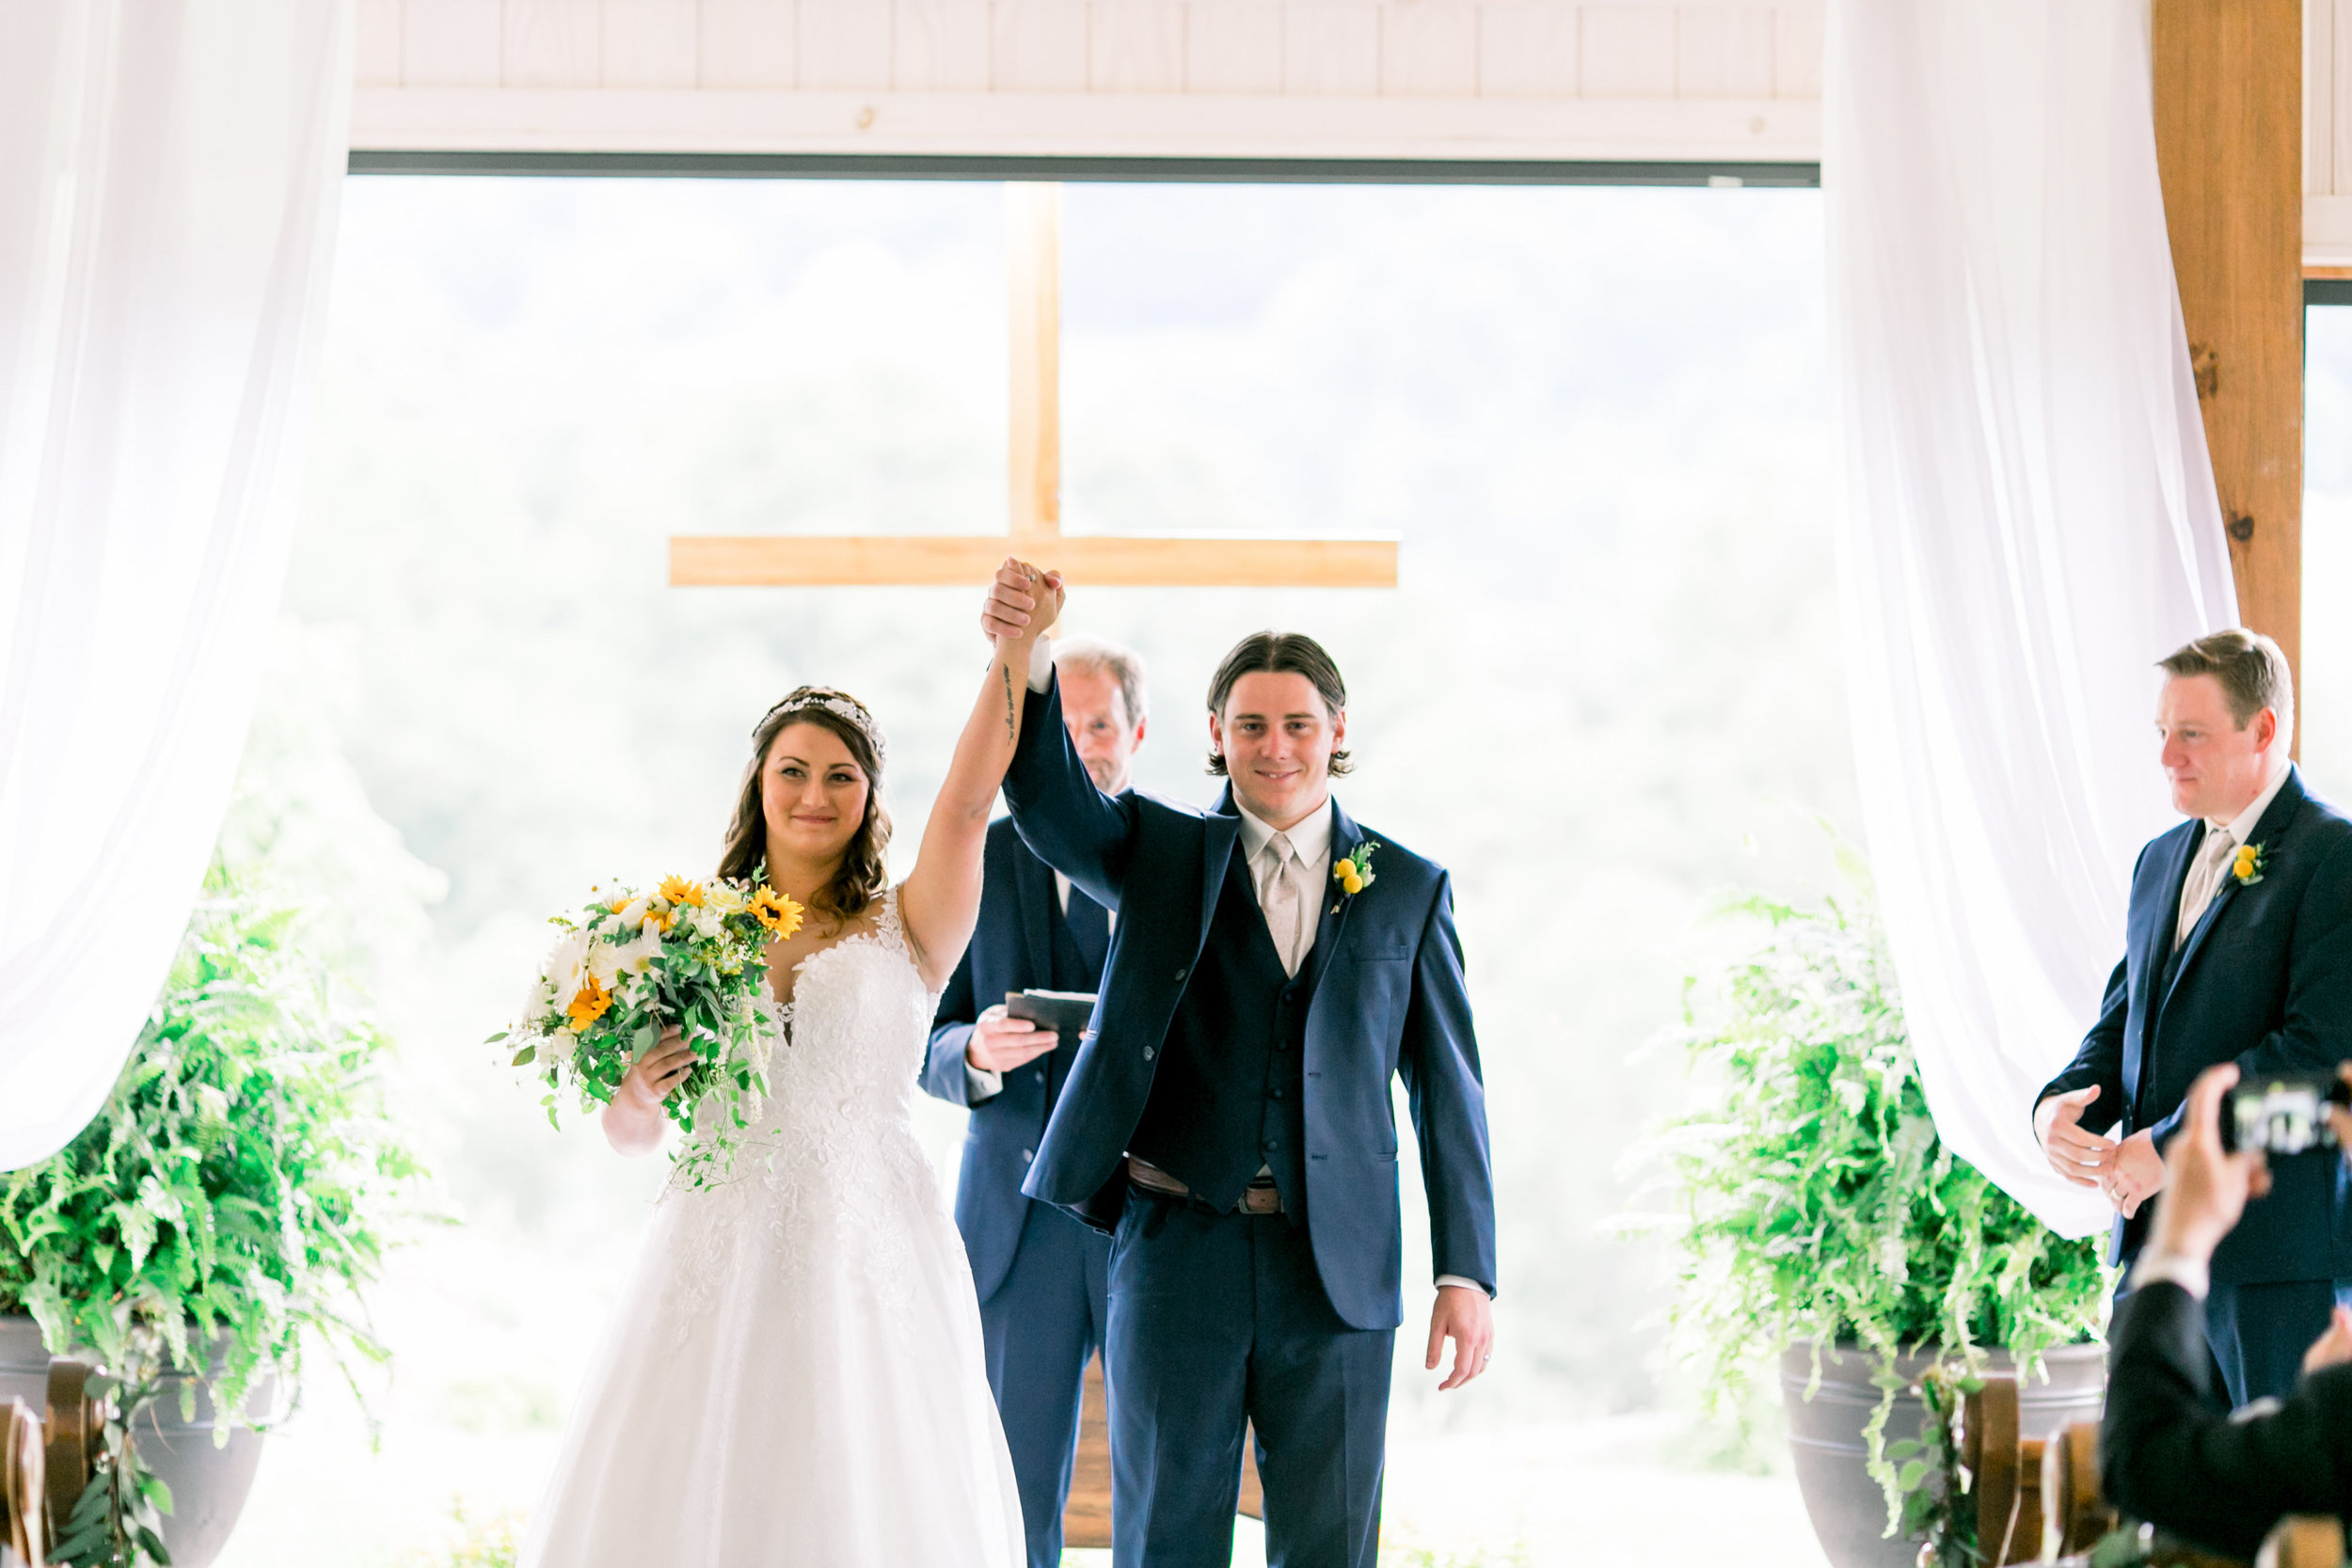 Joy-Unscripted-Wedding-Calligraphy-Kendall-11.jpg